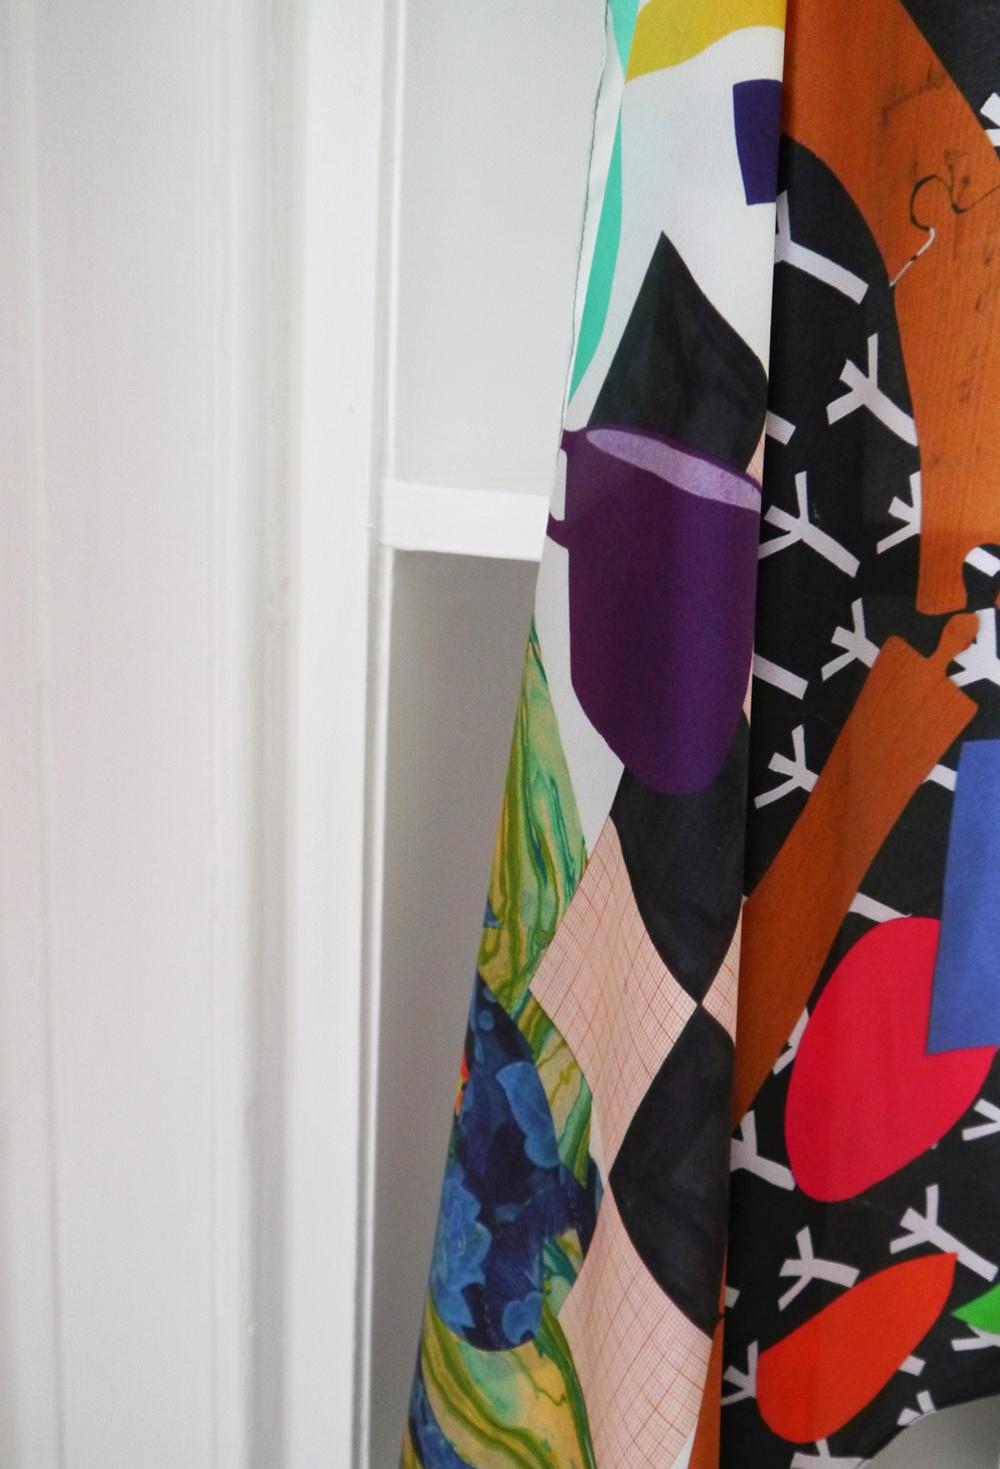 Scarf School, Scarf School Graduation, Edinburgh, Hill Street Design House, Karen Mabon, Scarf Design, Scottish Bloggers, blogging duo, pattern, patterned scarf